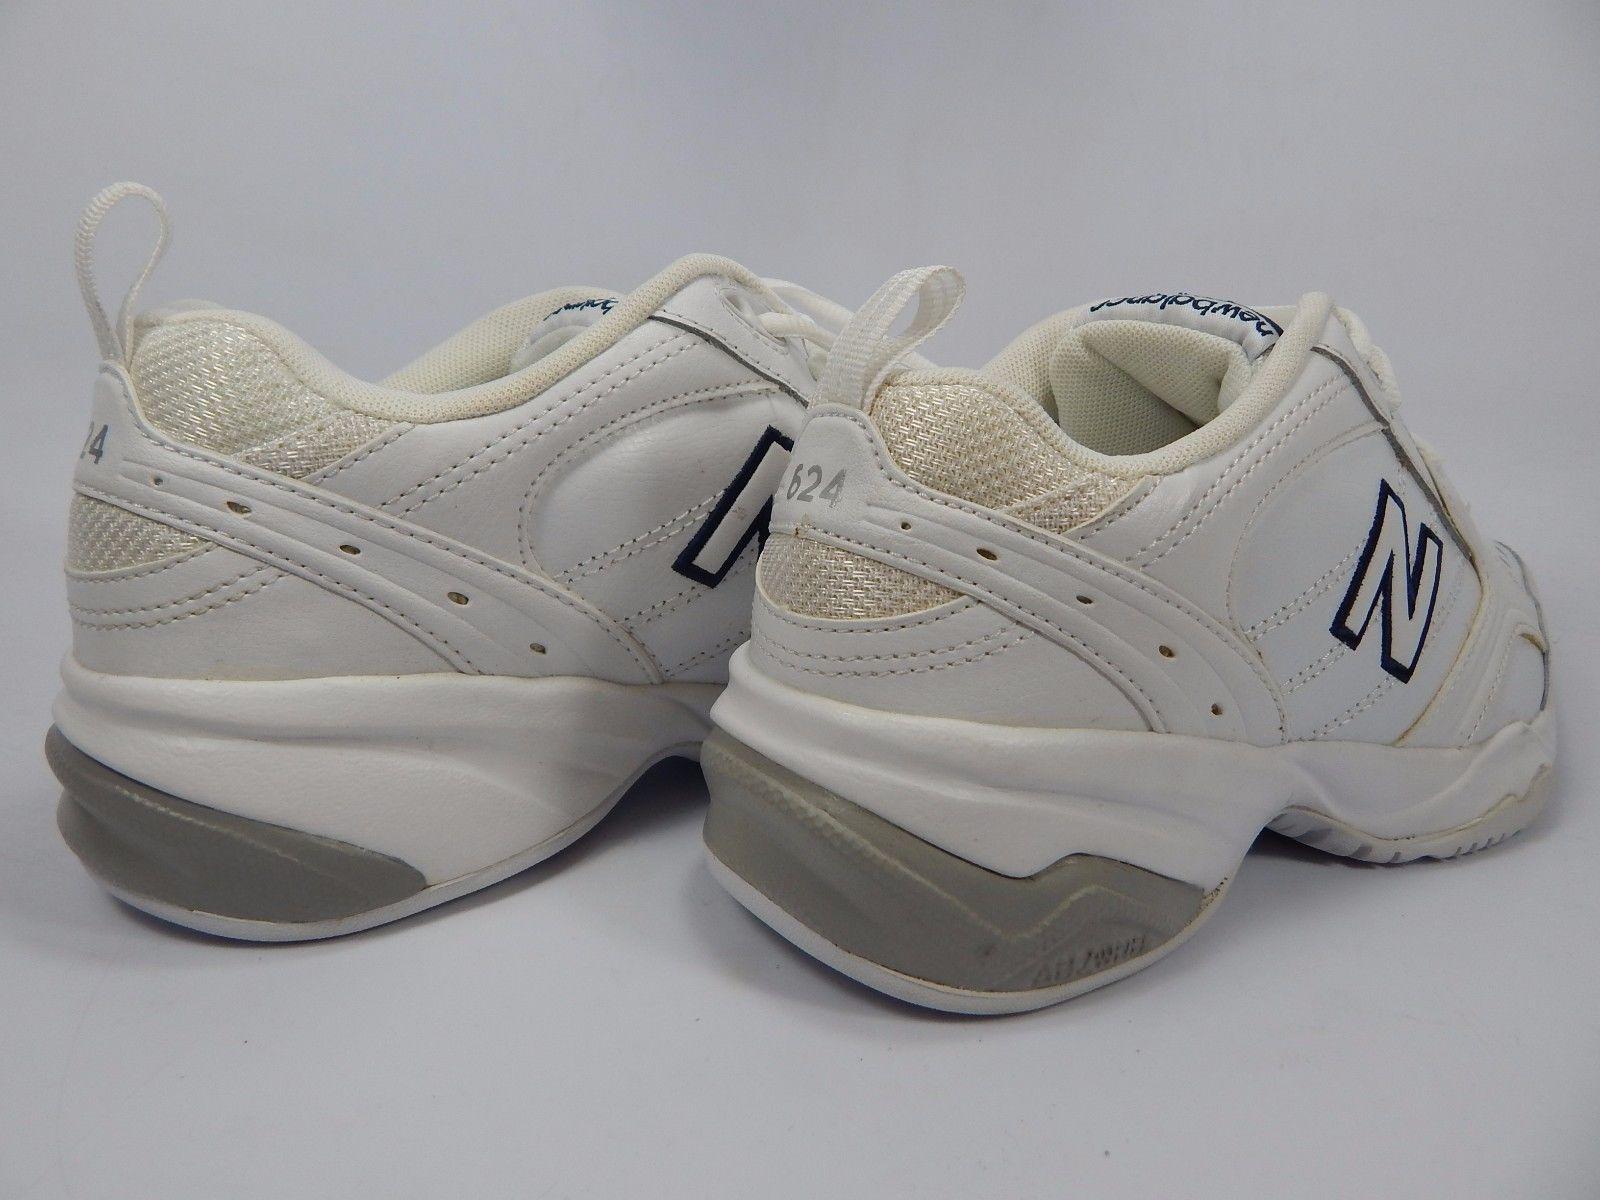 New Balance 624 v2 Women's Cross Training Shoes Size US 7 M (B) EU 37.5 WX624WT2